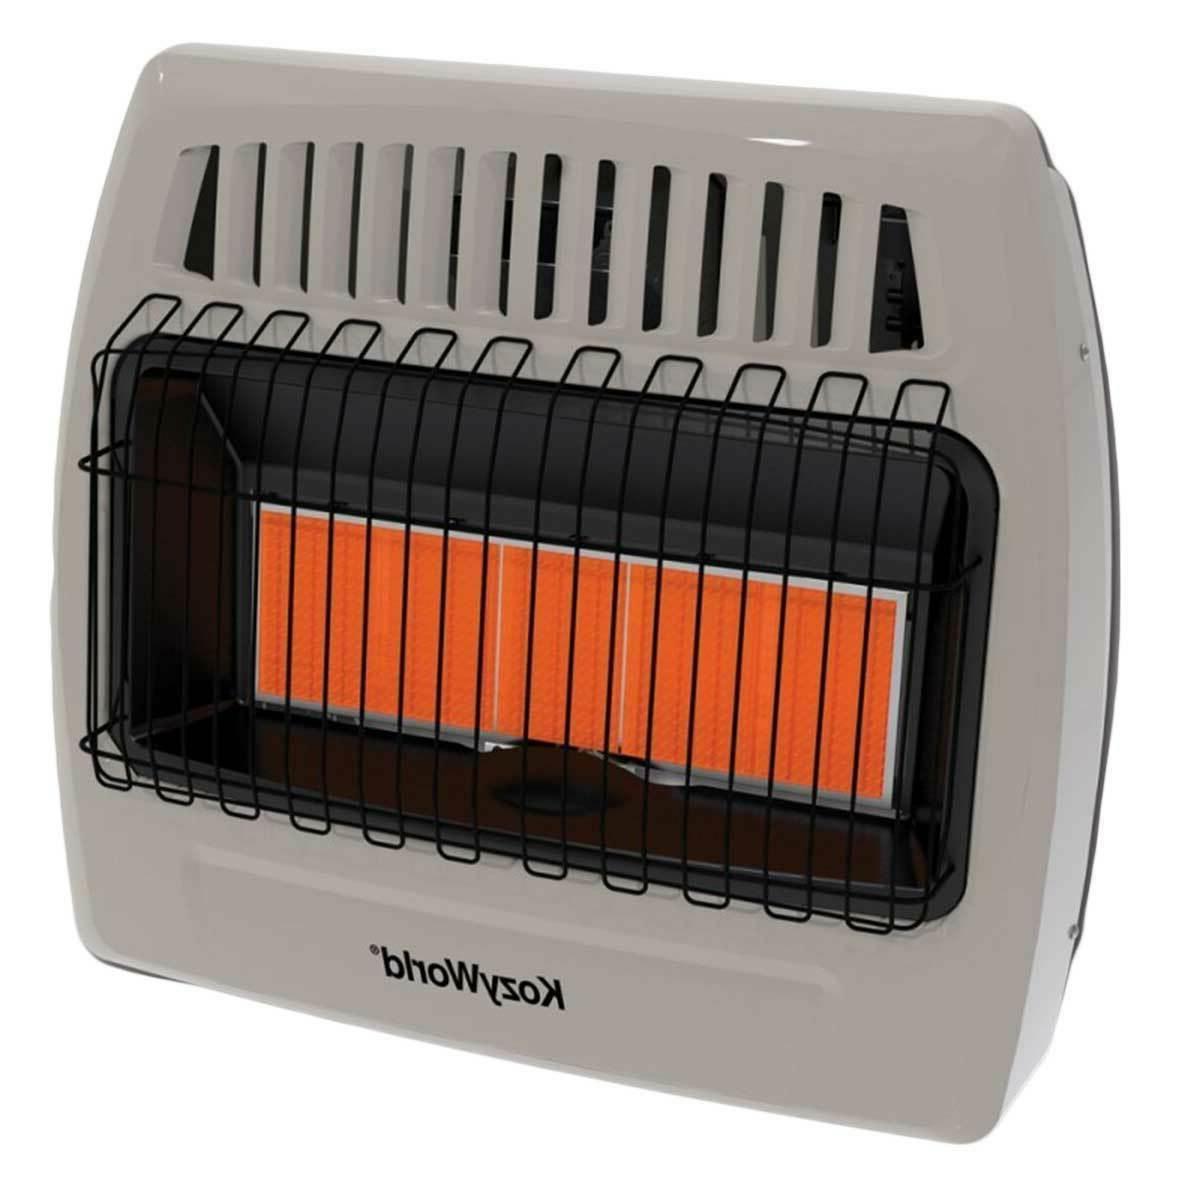 kwp524 gas wall heater